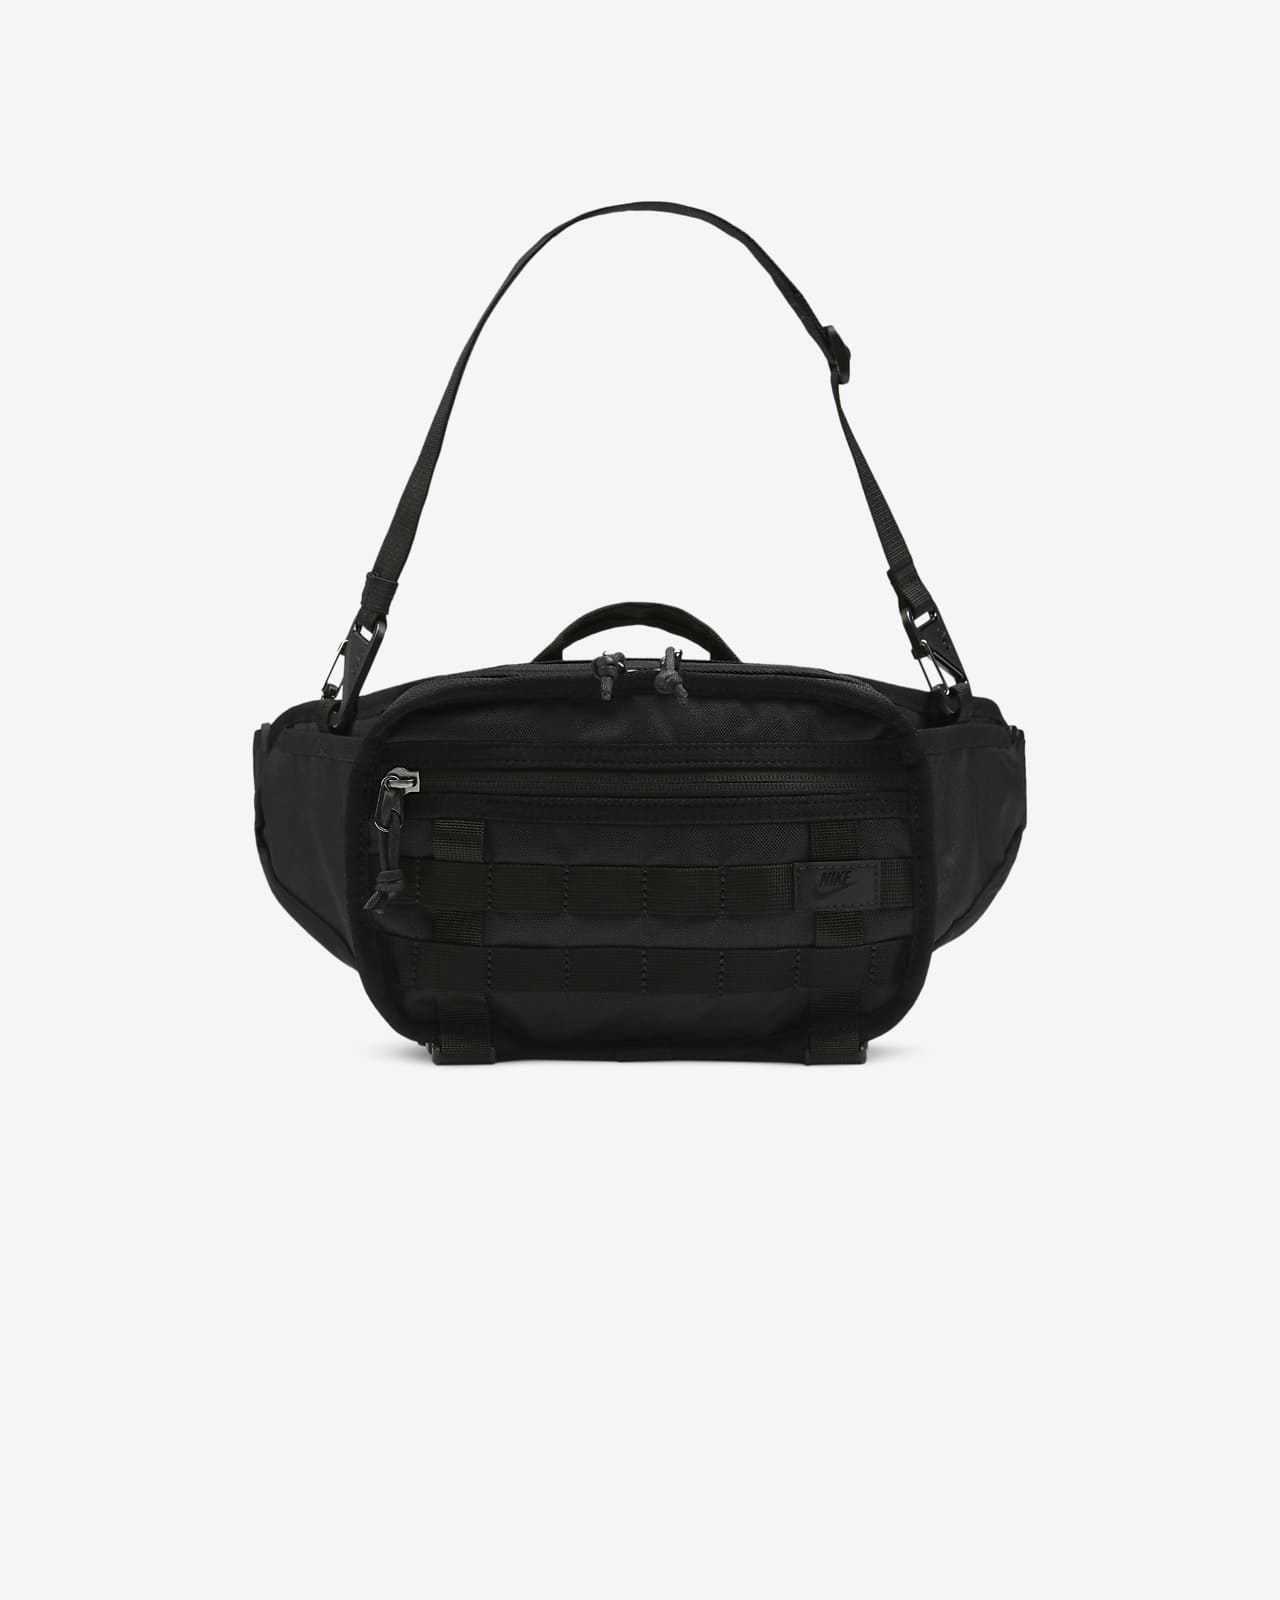 Поясная сумка Nike Sportswear RPM (для мелких предметов)